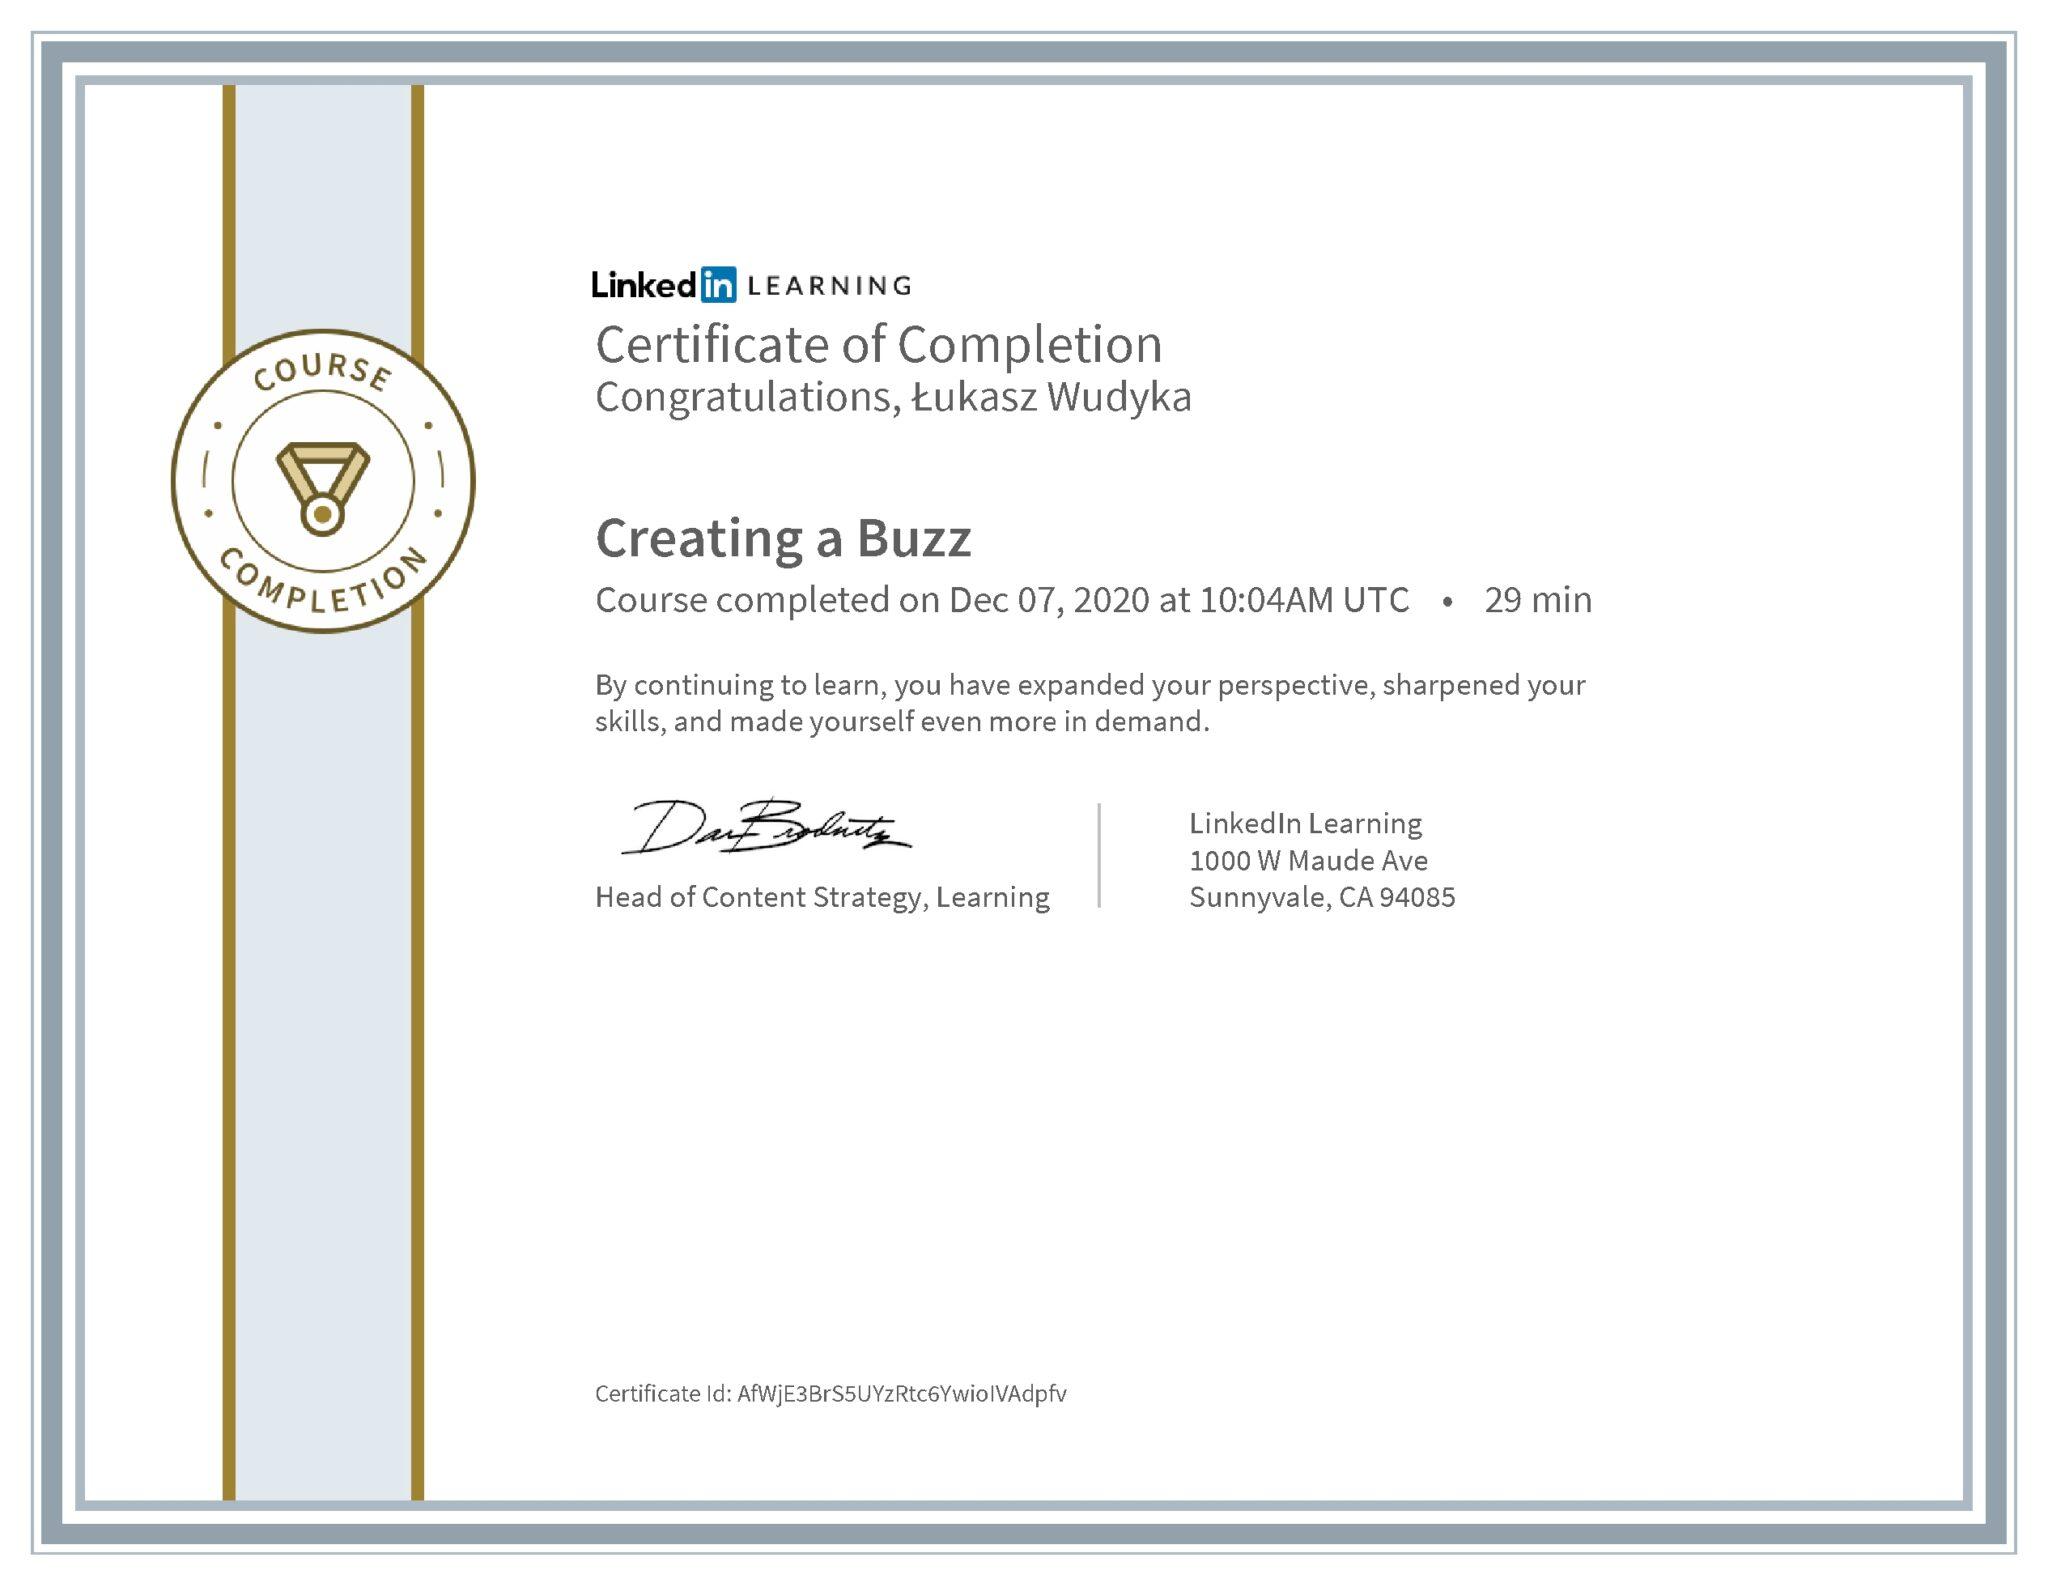 Łukasz Wudyka certyfikat LinkedIn Creating a Buzz